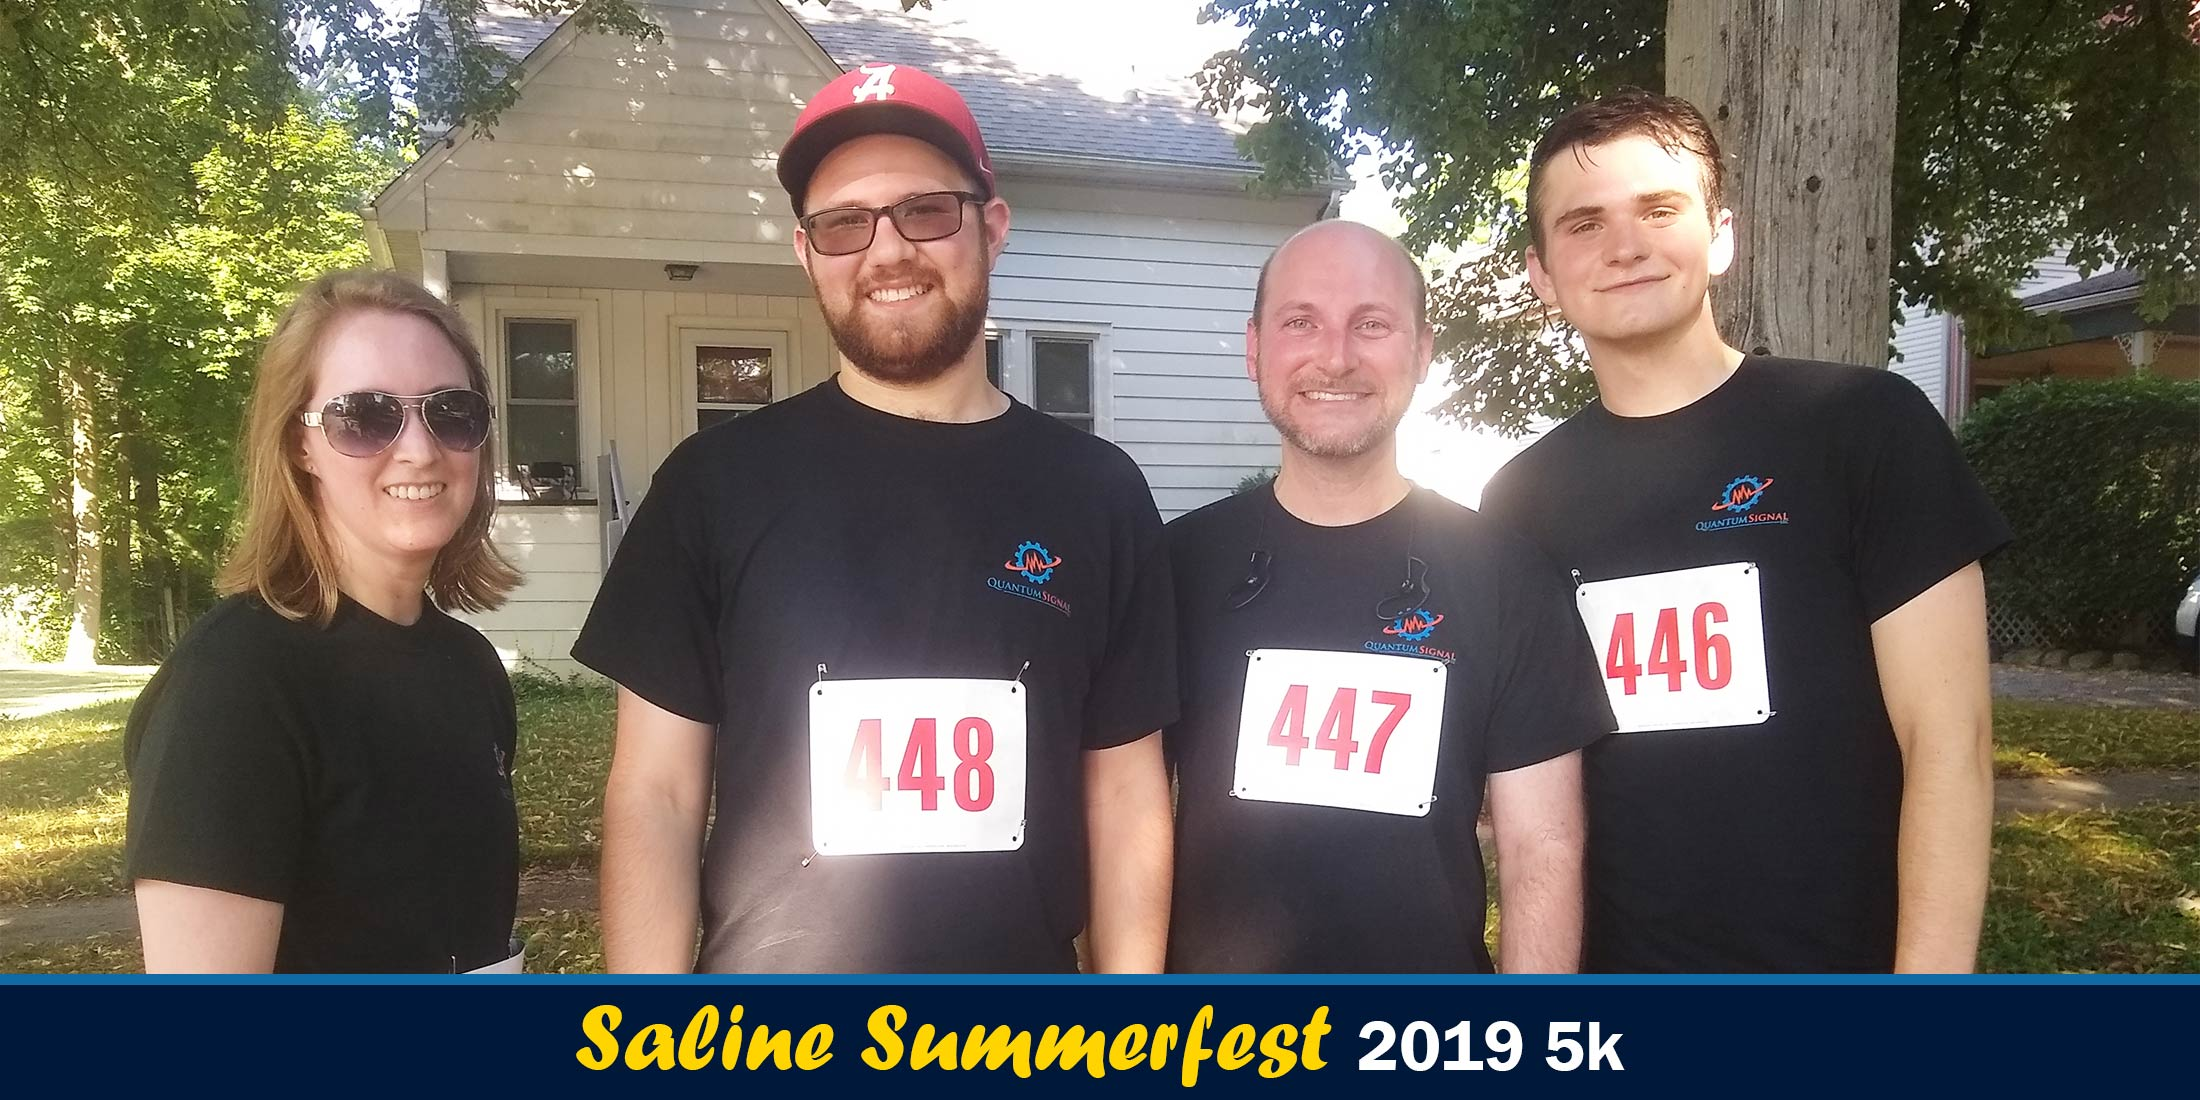 Saline Summerfest 2019 5k group photo